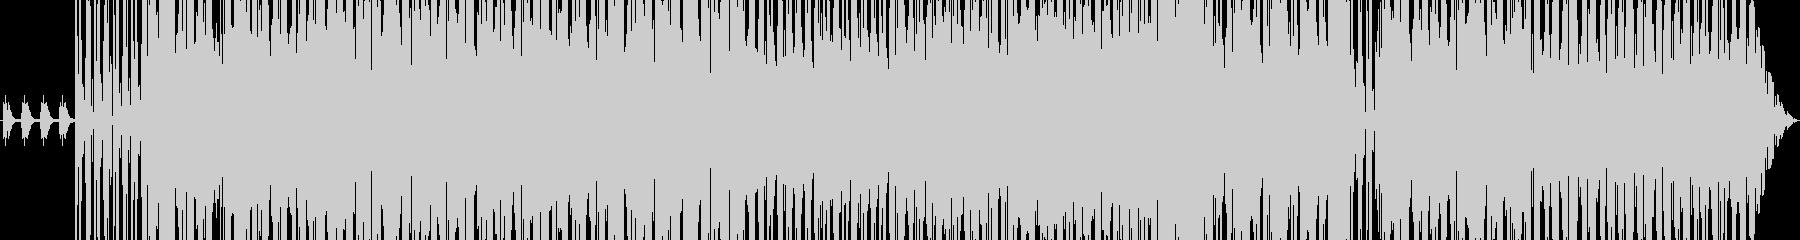 SEXYなHIPHOPの未再生の波形